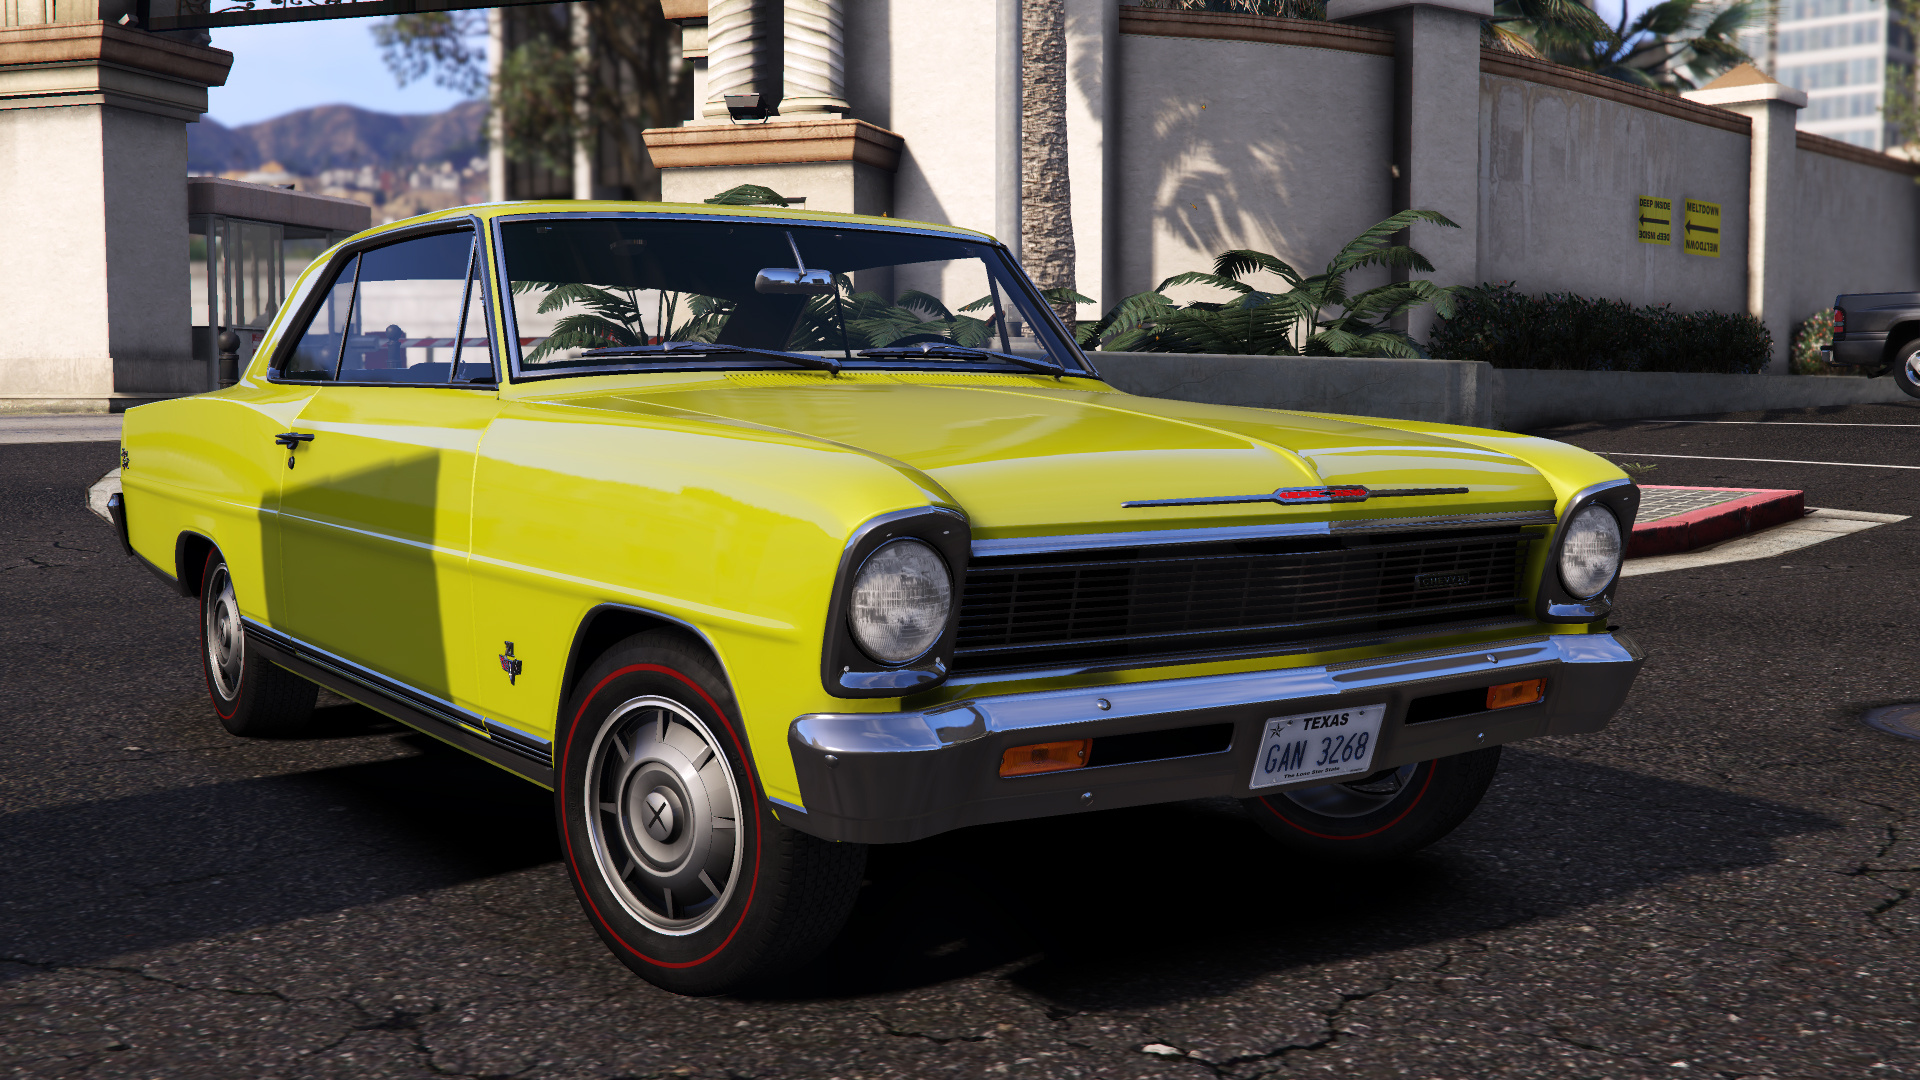 1966 Chevrolet Chevy Ii Nova Ss B2f18f Grand Theft Auto V Screenshot 20180105 21320443 38660345435 O